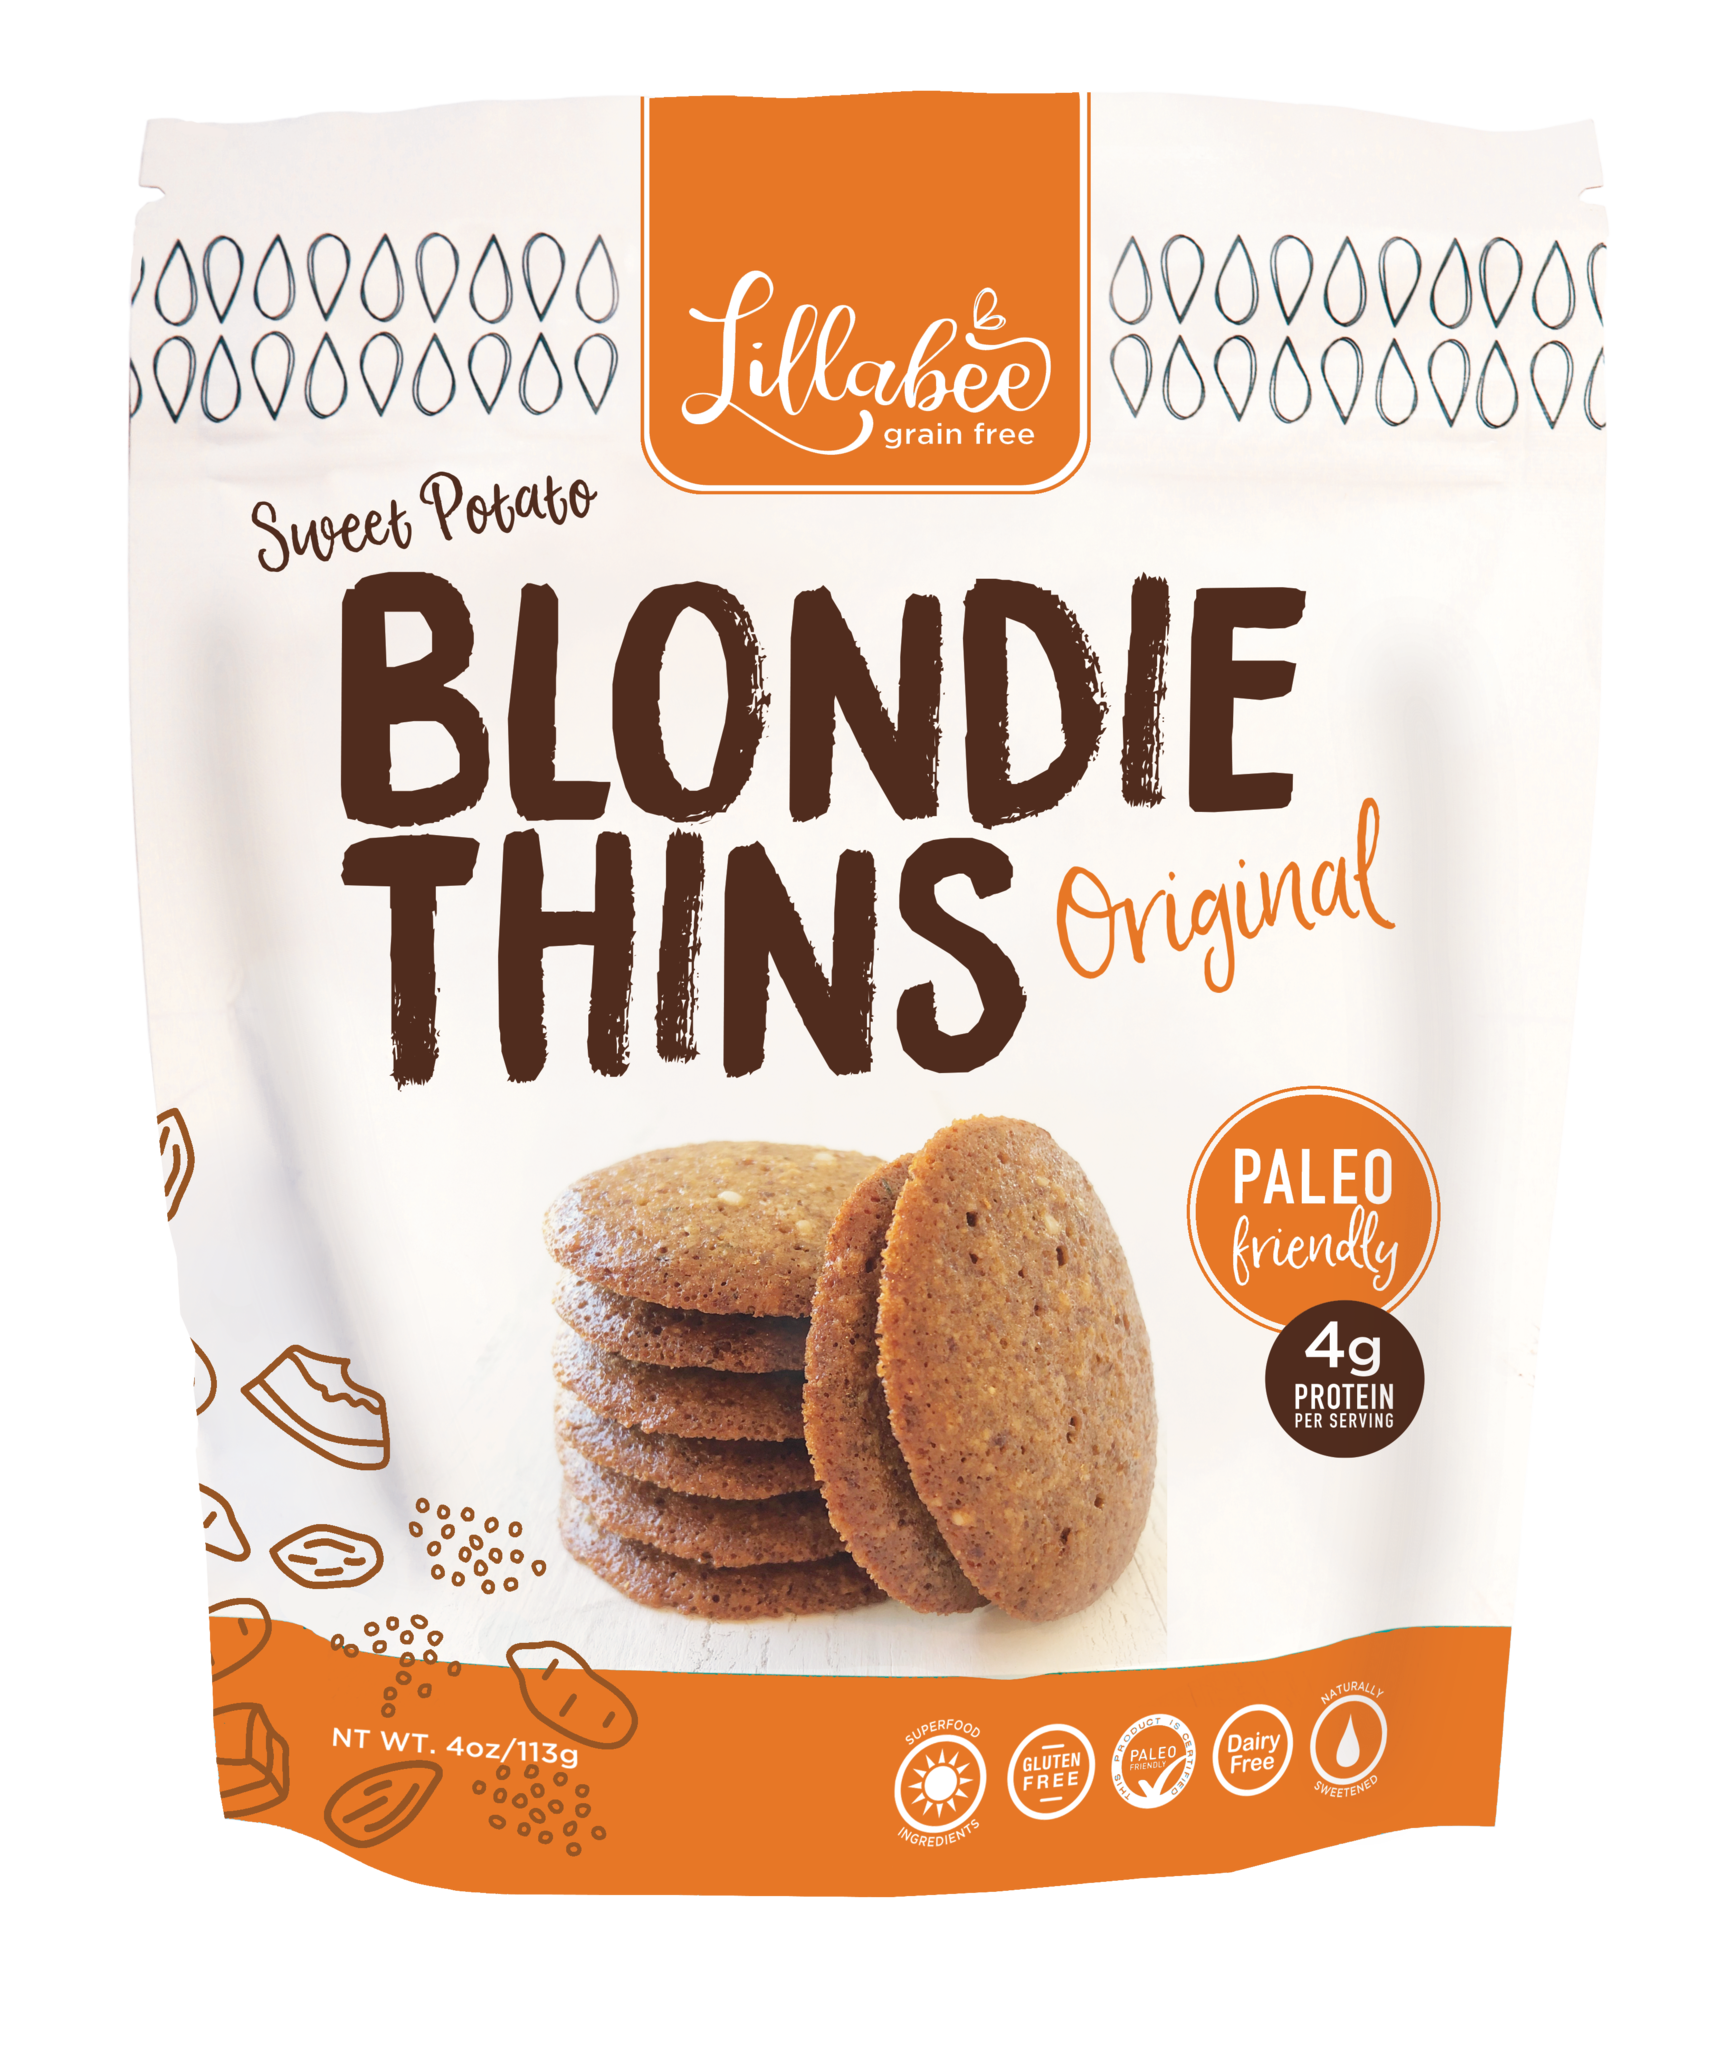 Blondie Thins Original - Lillabee Snacks - Paleo Friendly by the Paleo Foundation